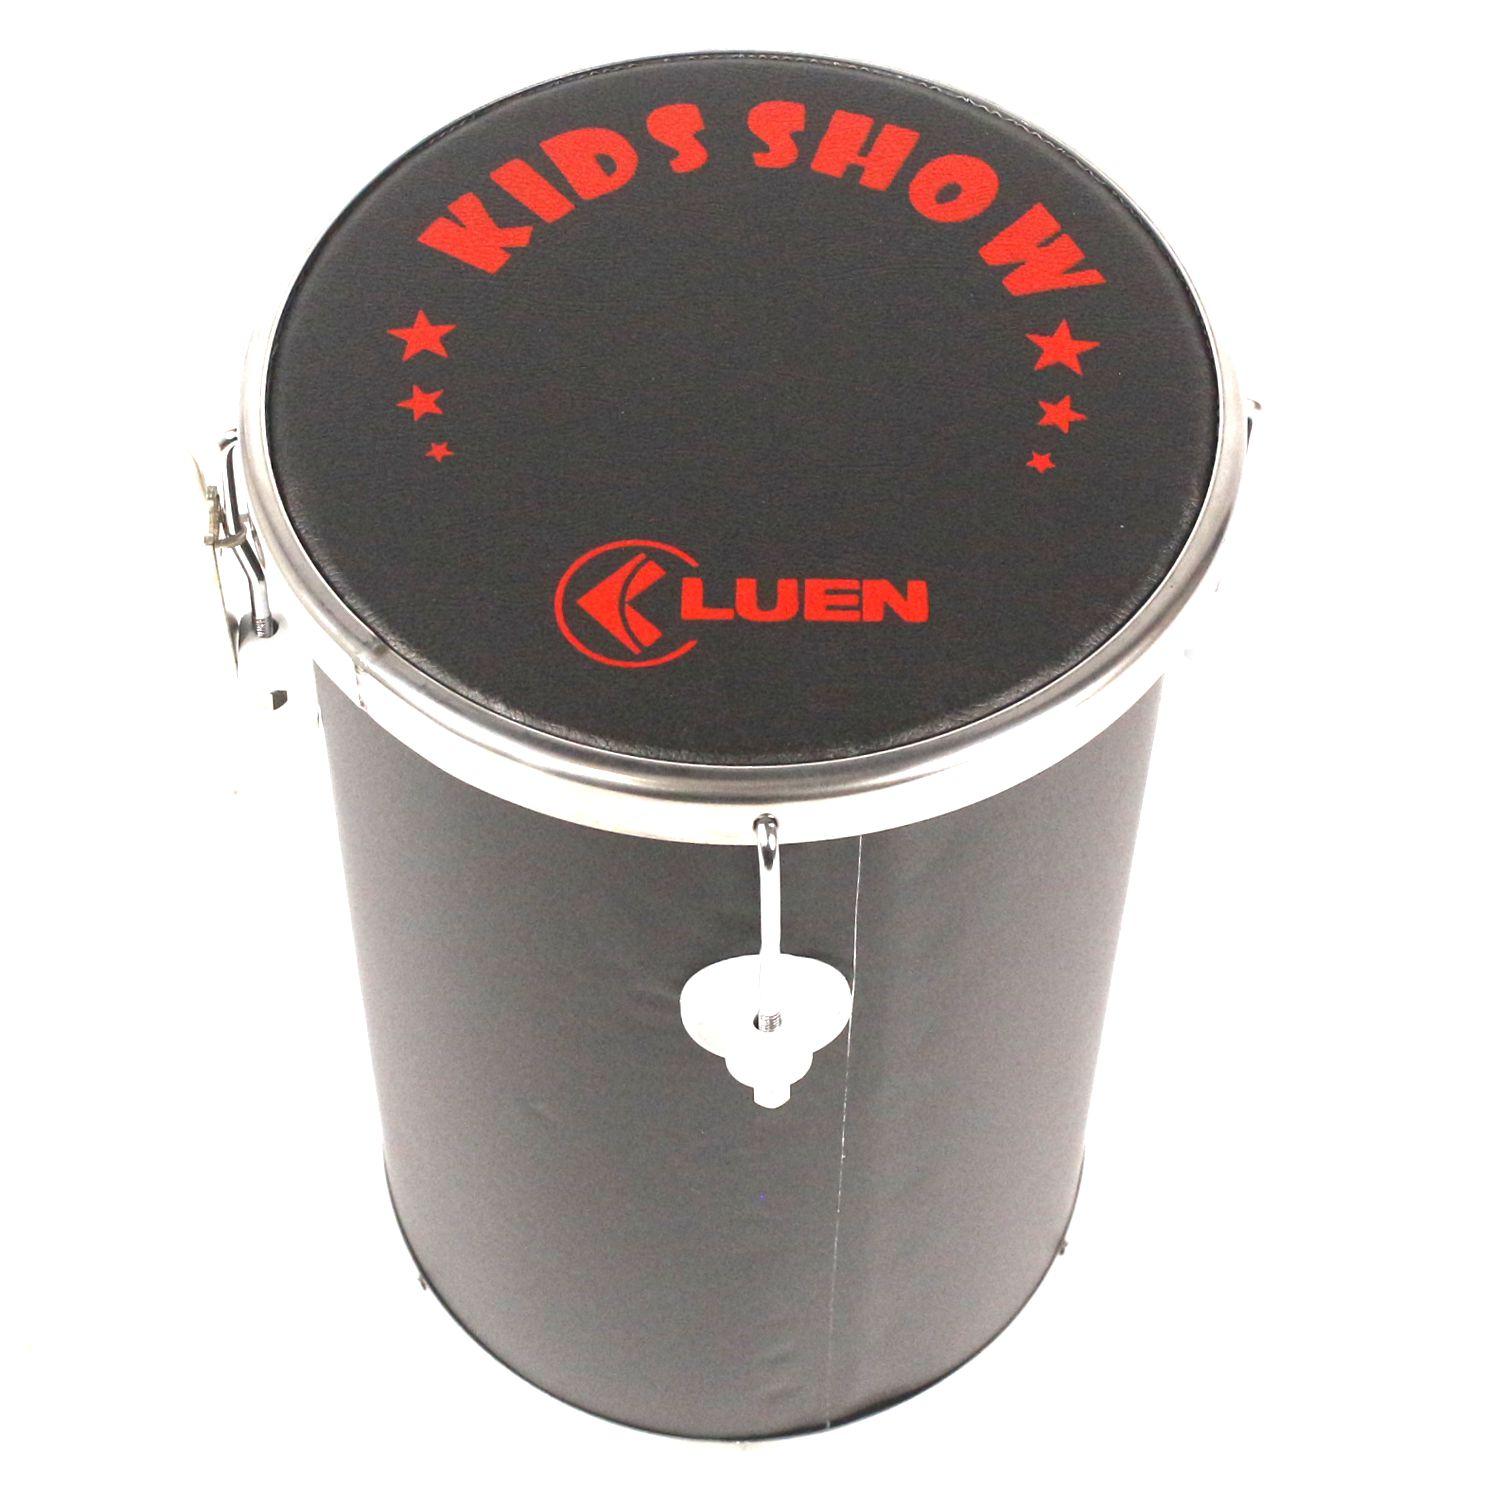 Tantam Infantil Luen KIDS SHOW 10 X 40 - Preto - 29465 PT